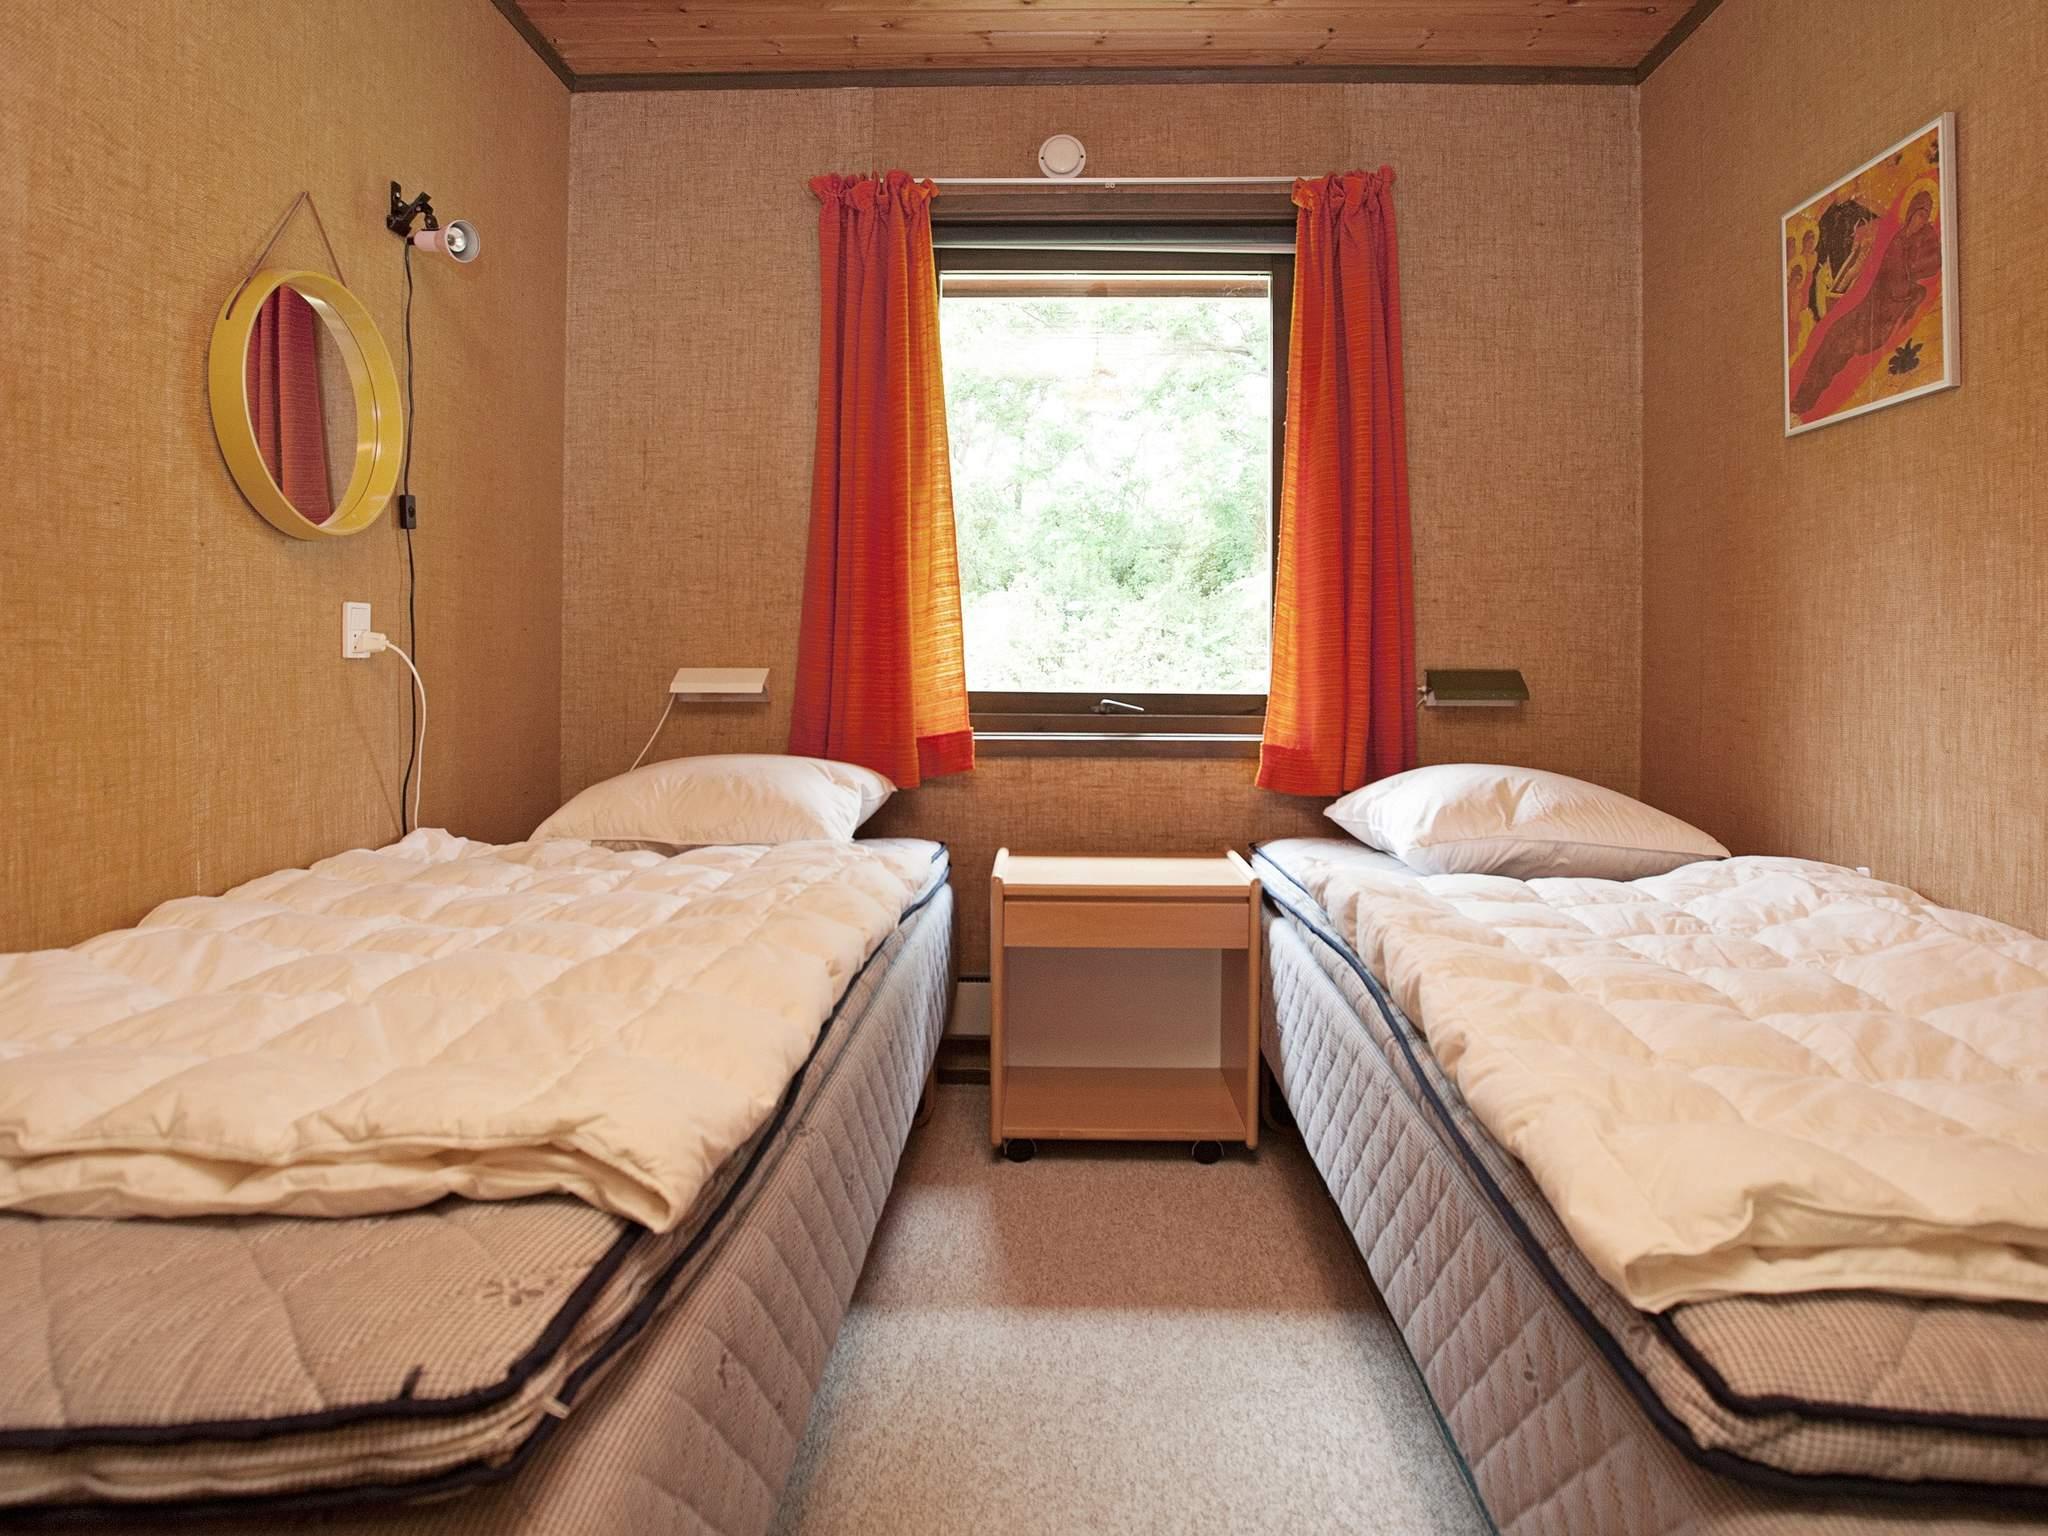 Ferienhaus Holløselund Strand (1712460), Holløse, , Nordseeland, Dänemark, Bild 11